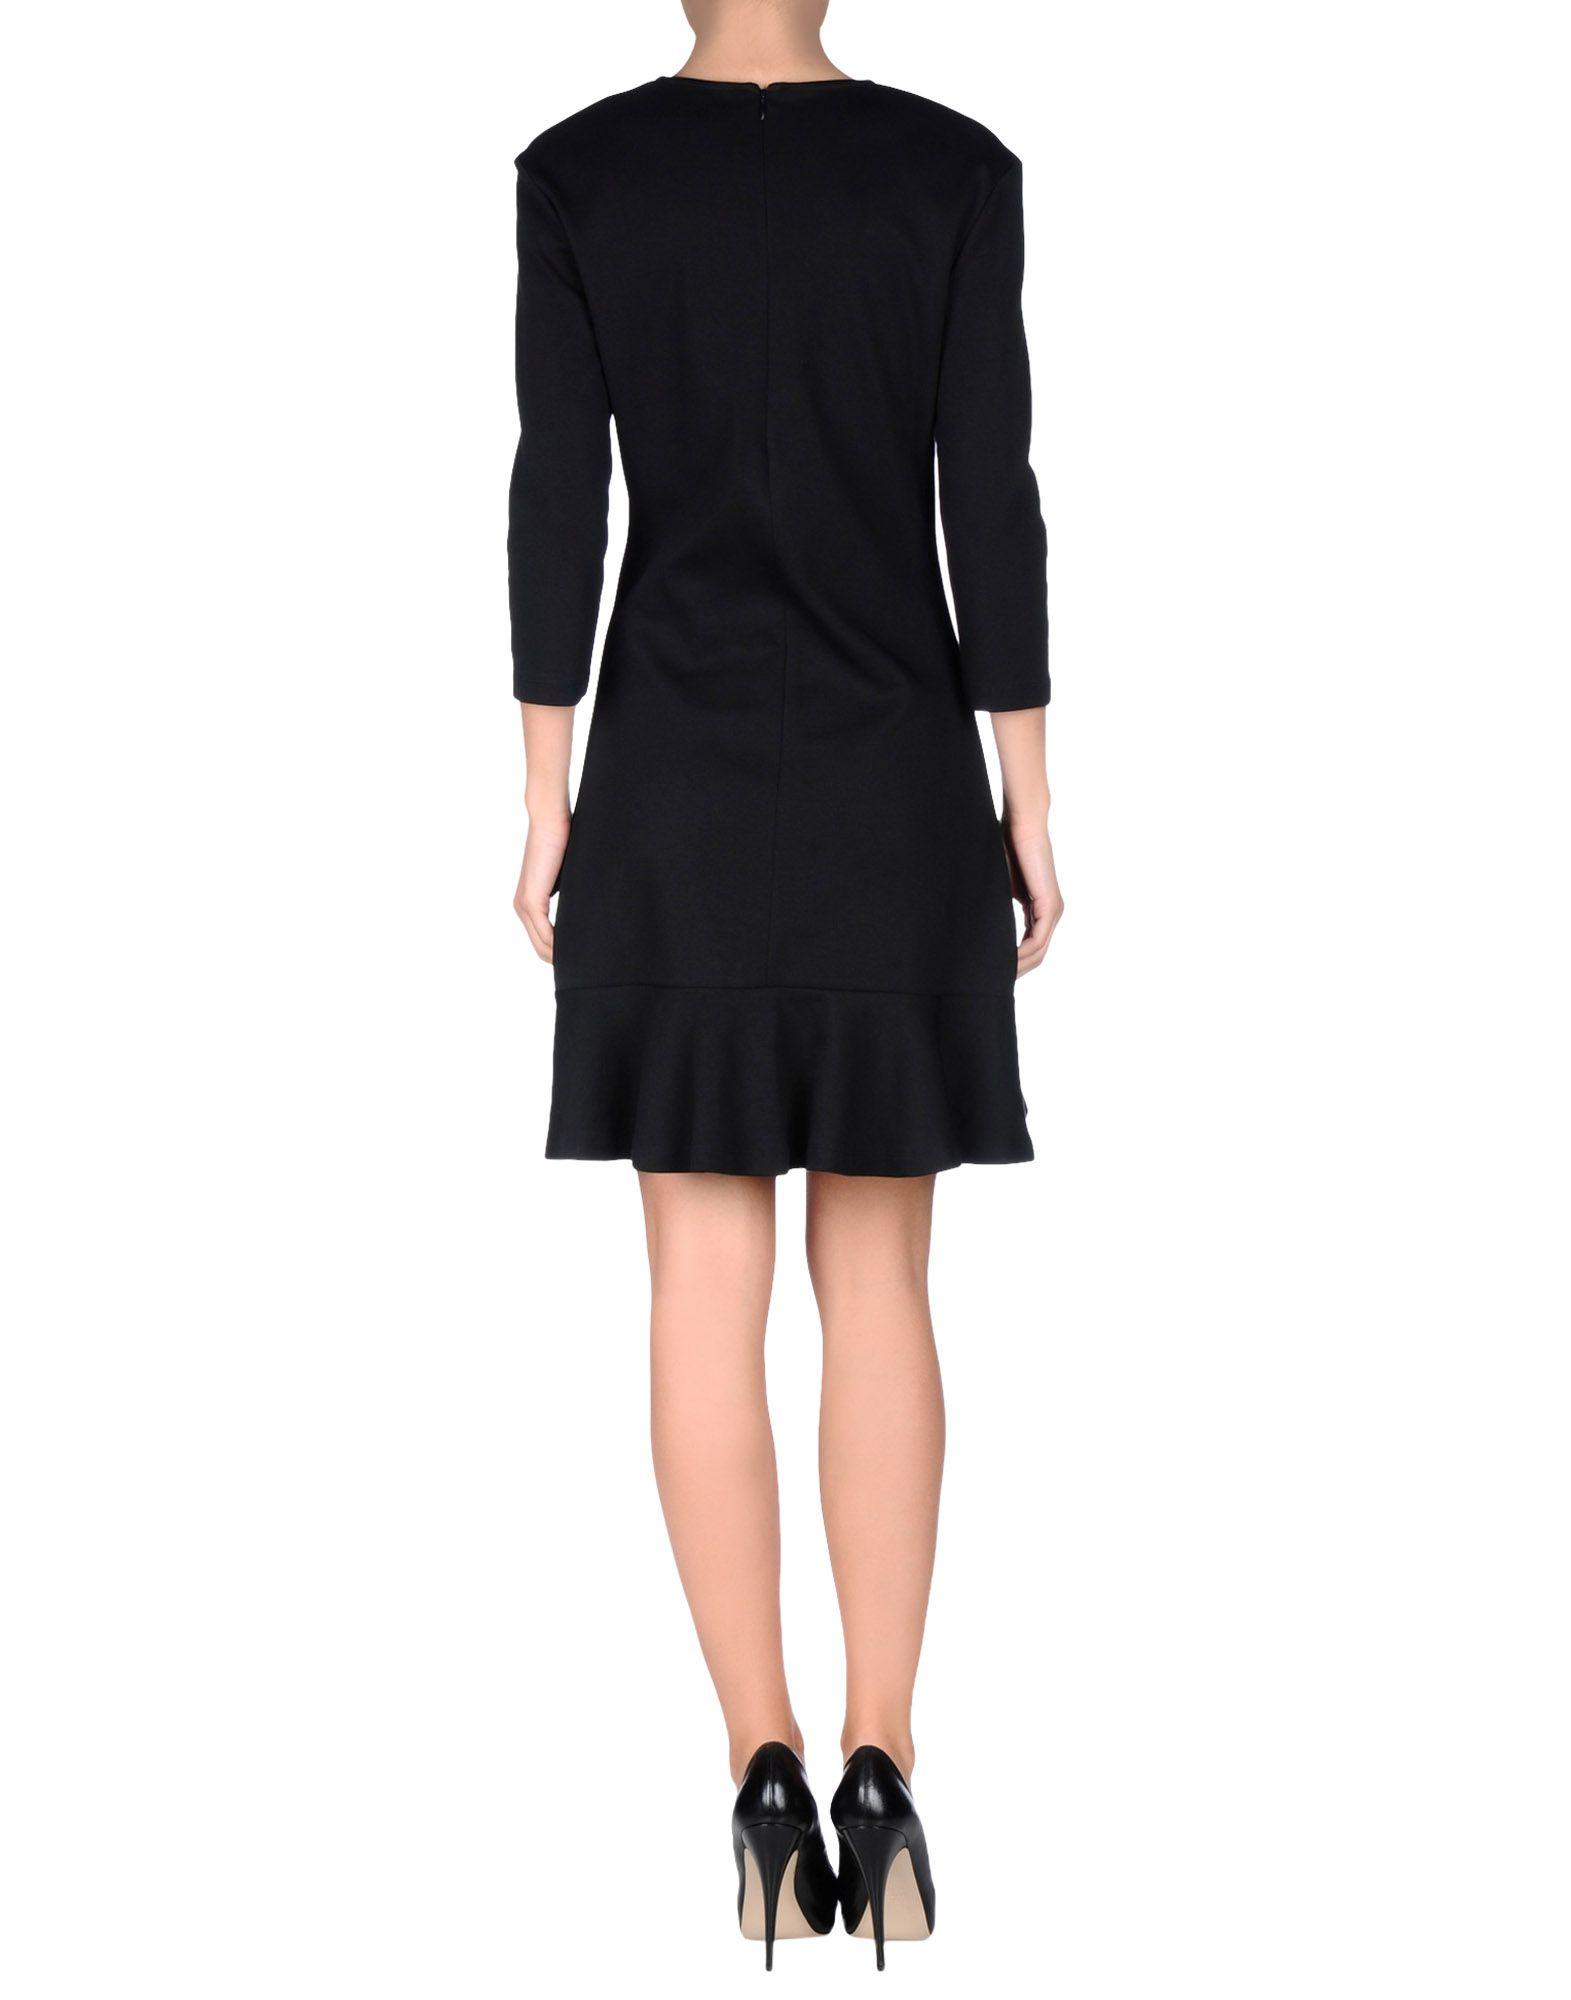 Mcq alexander mcqueen Short Dress in Black   Lyst